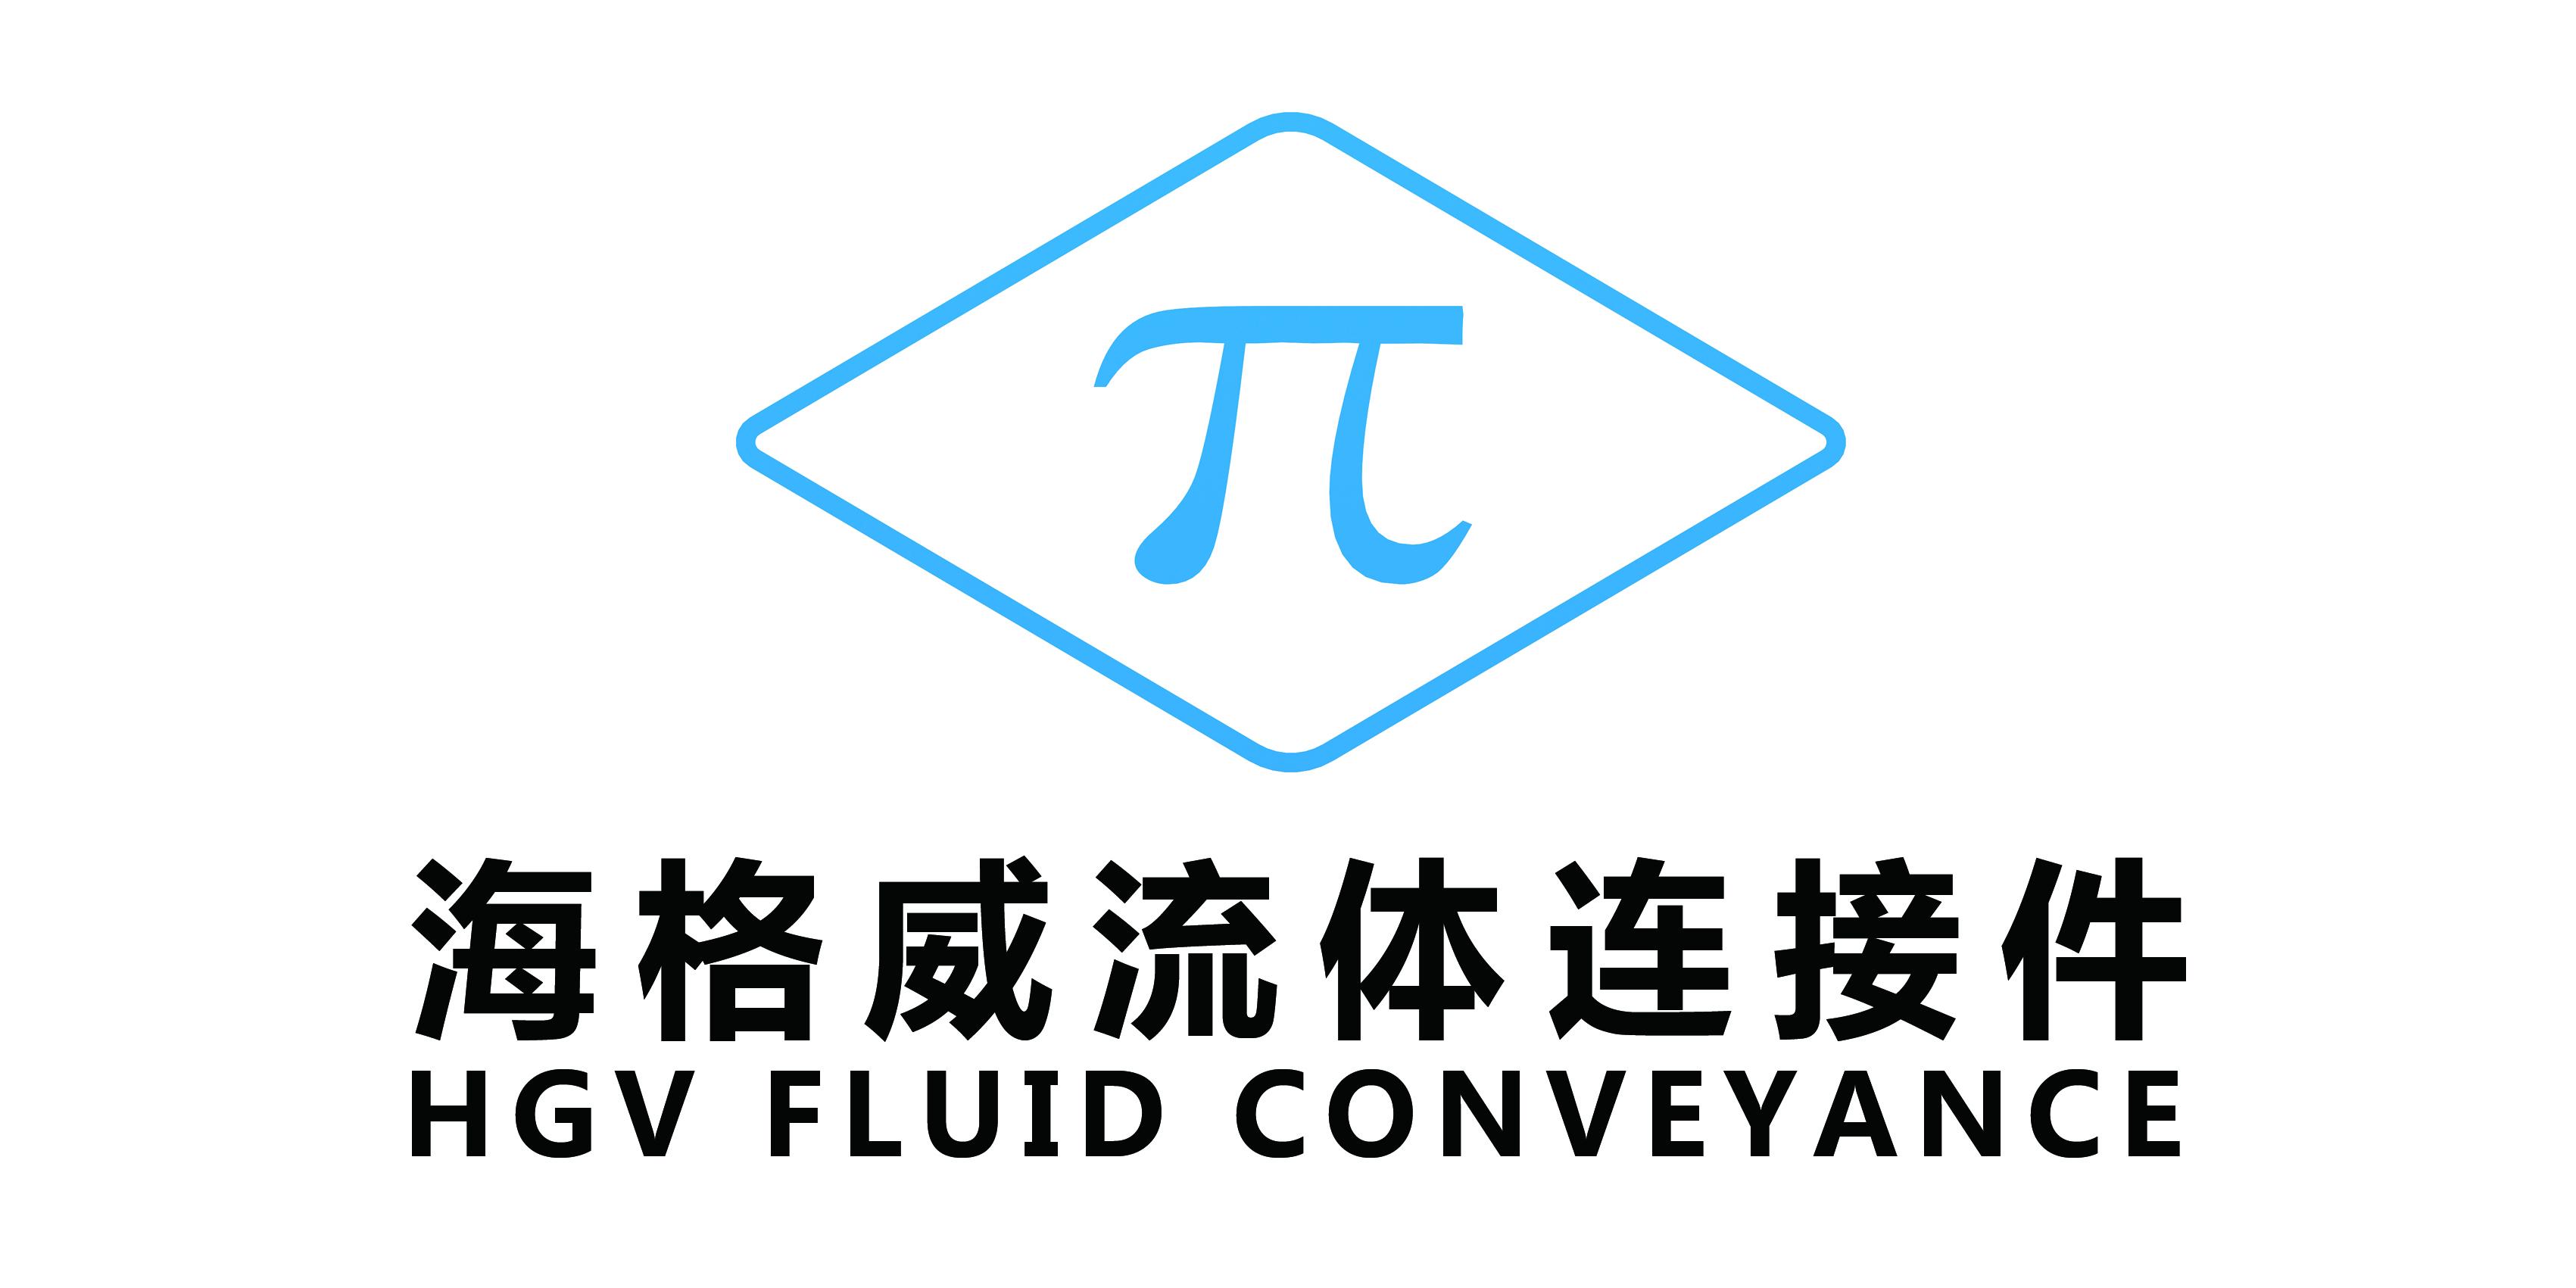 Ningbo HGV Fluid Conveyance Company logo